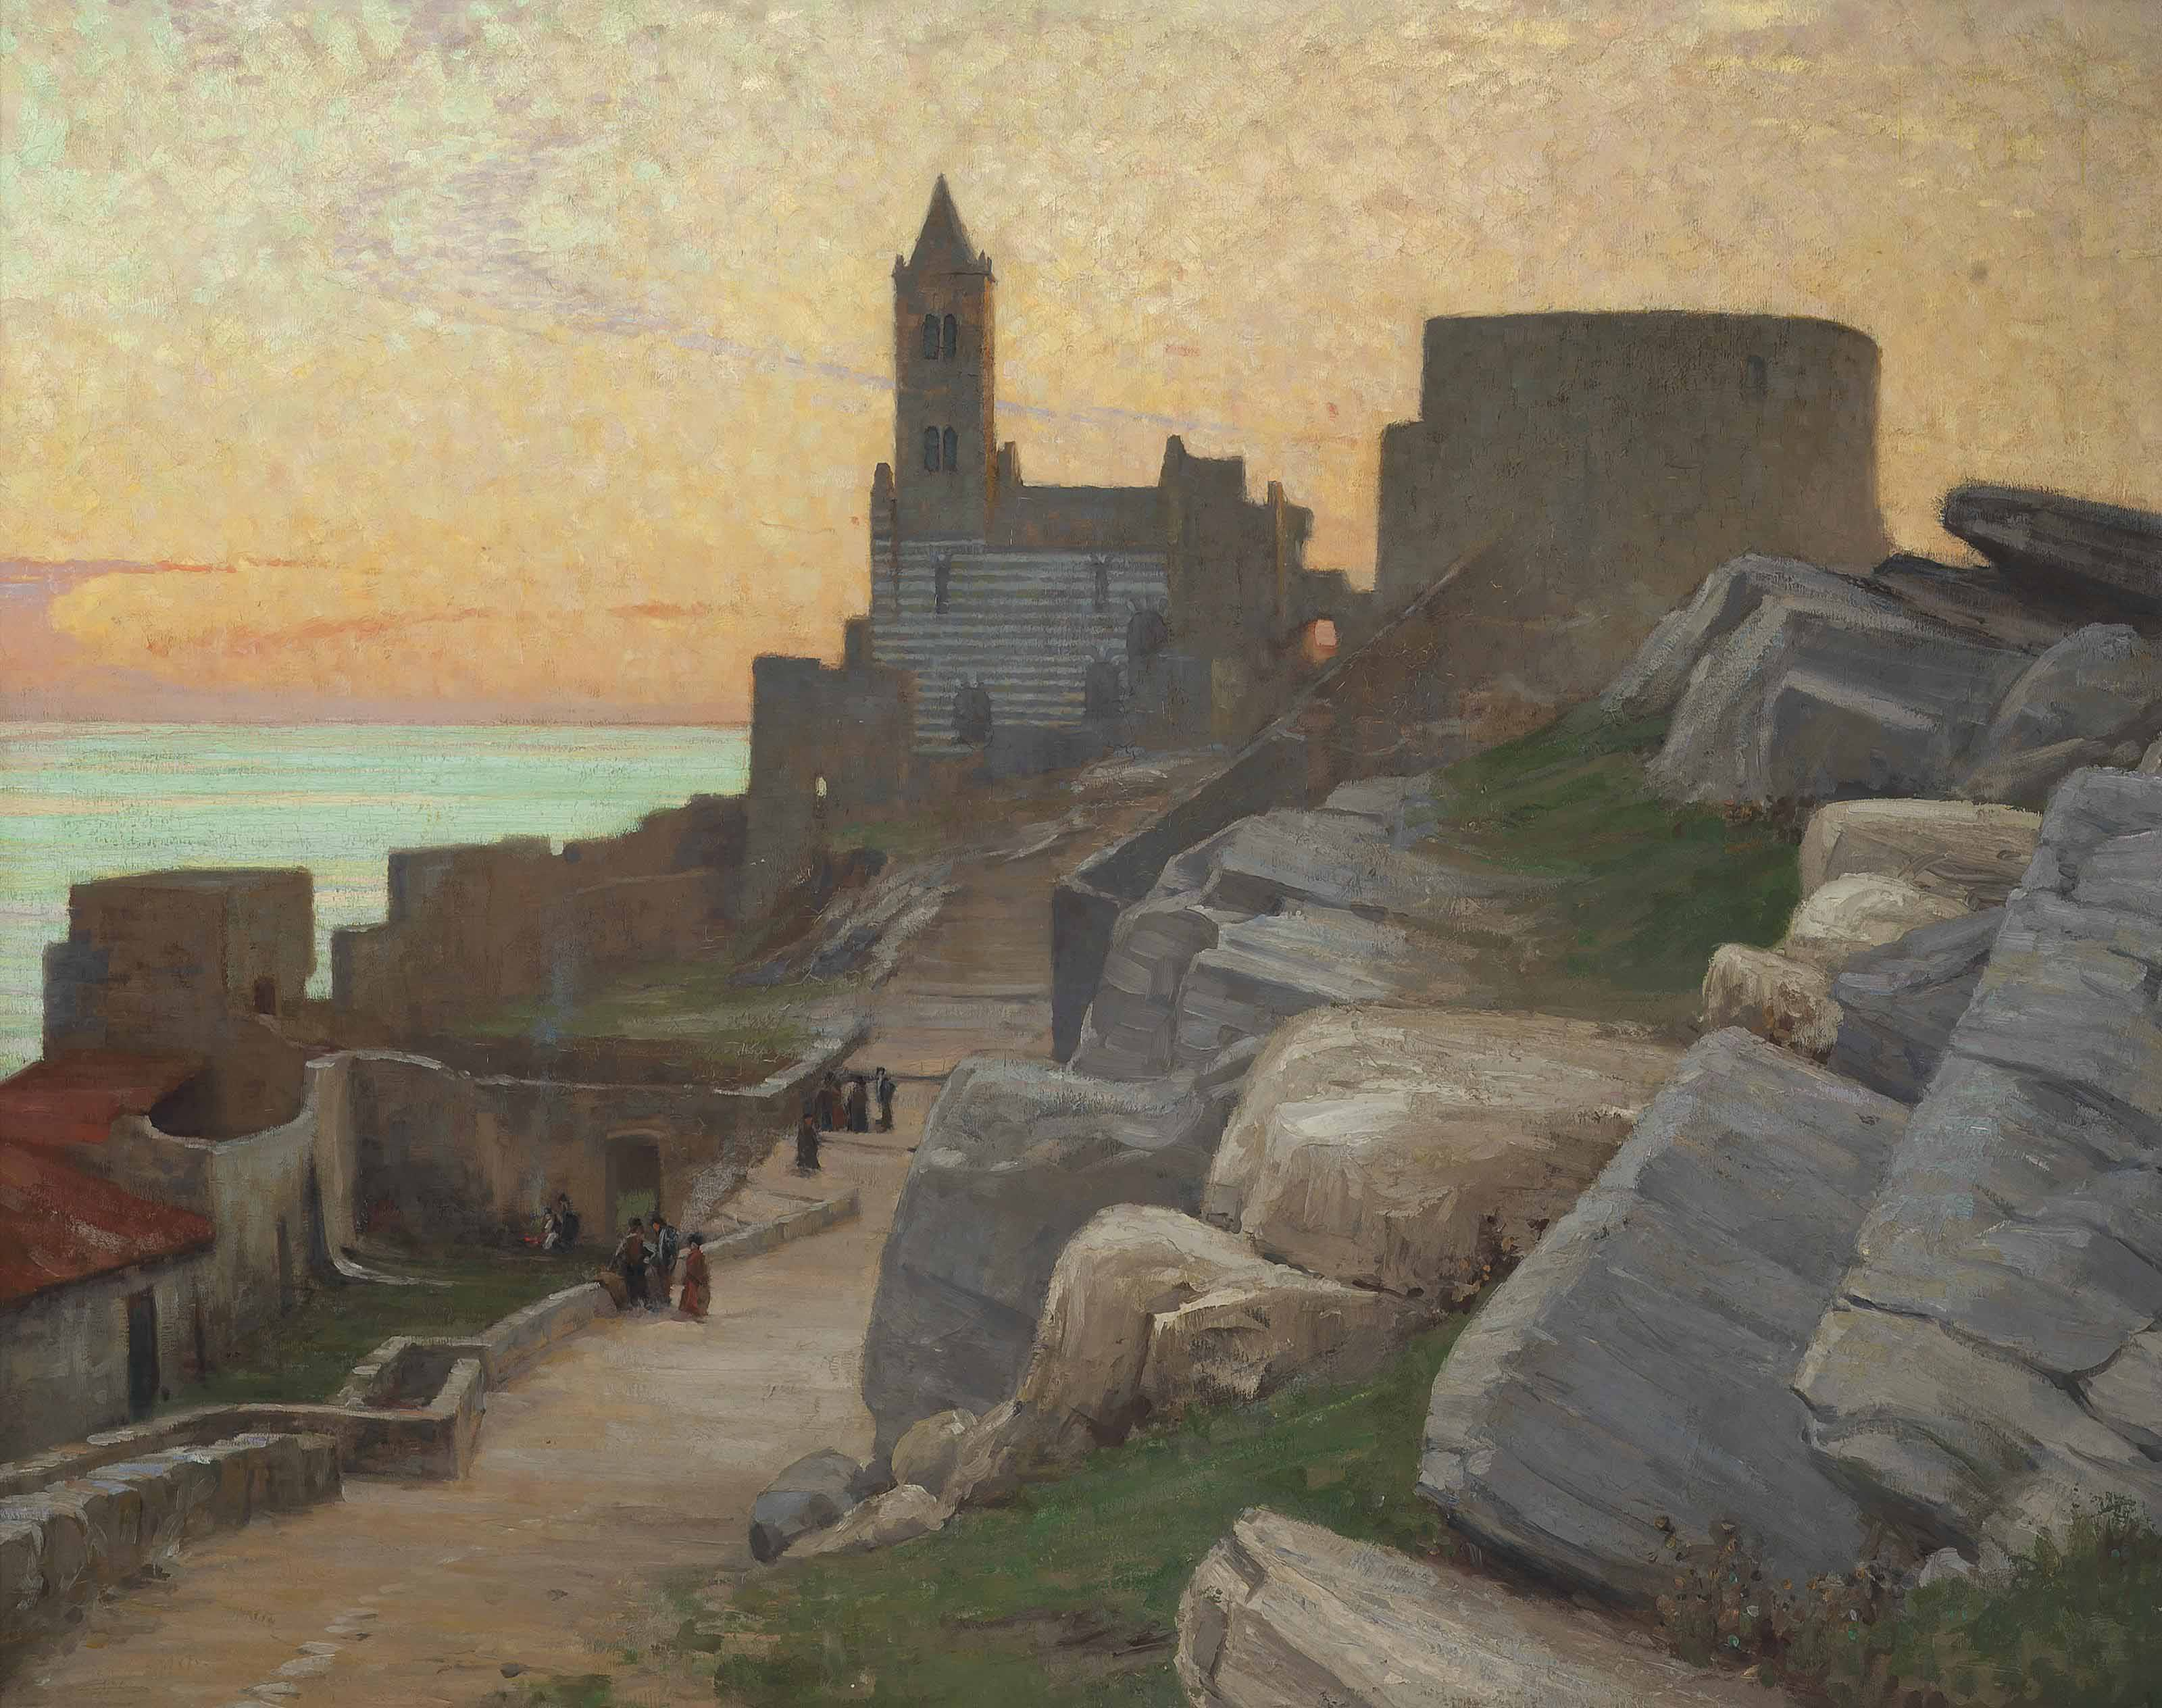 Alexander Mann, R.O.I. (1853-1